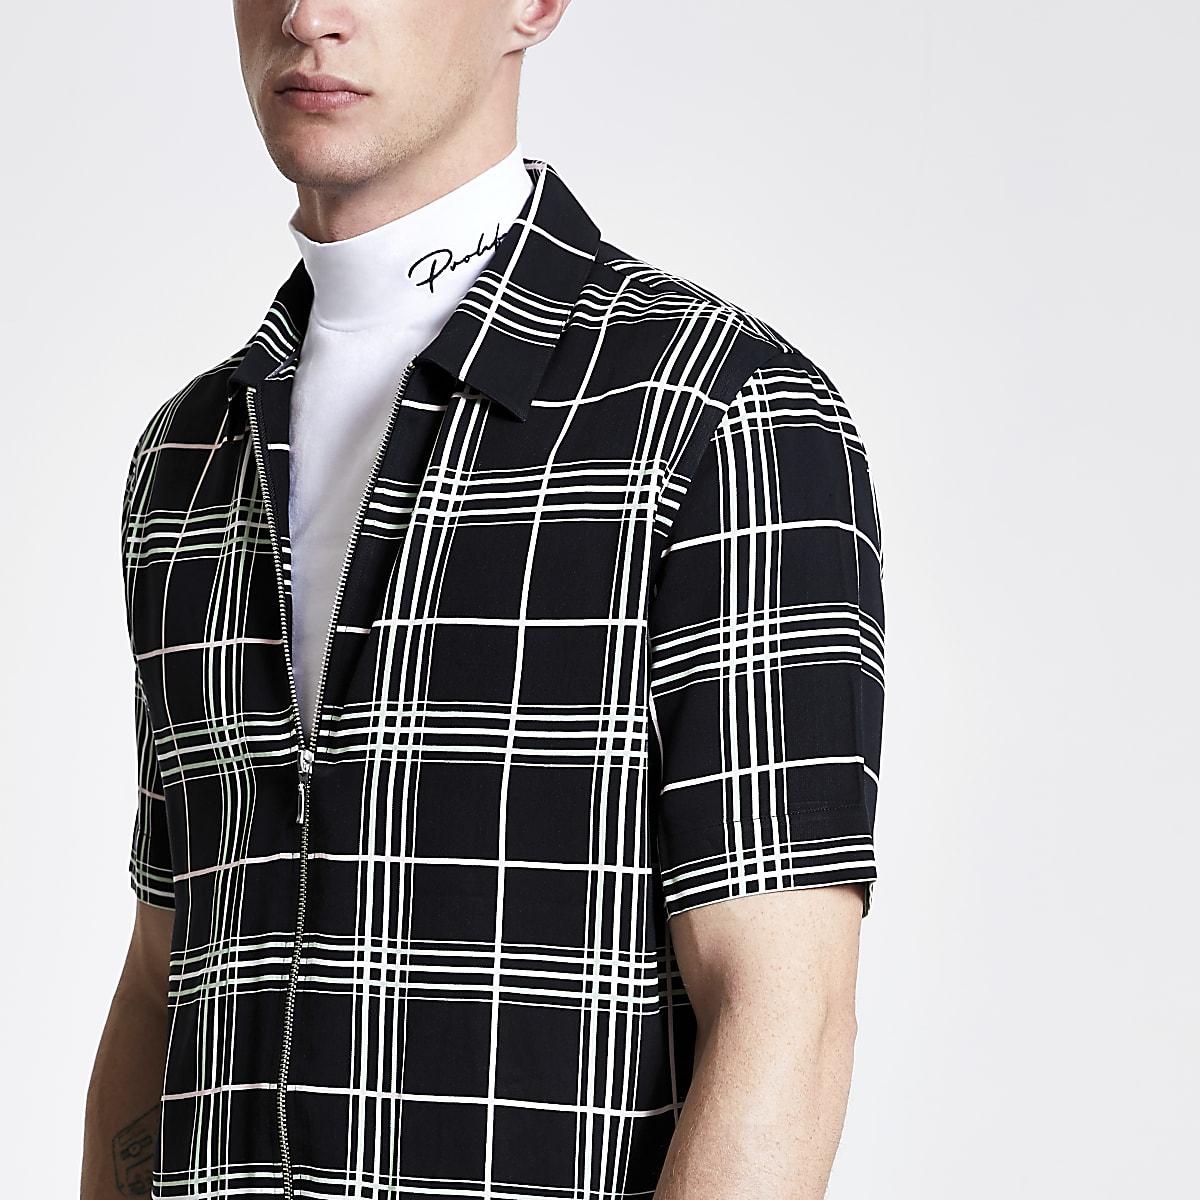 Black neon check zip up shirt